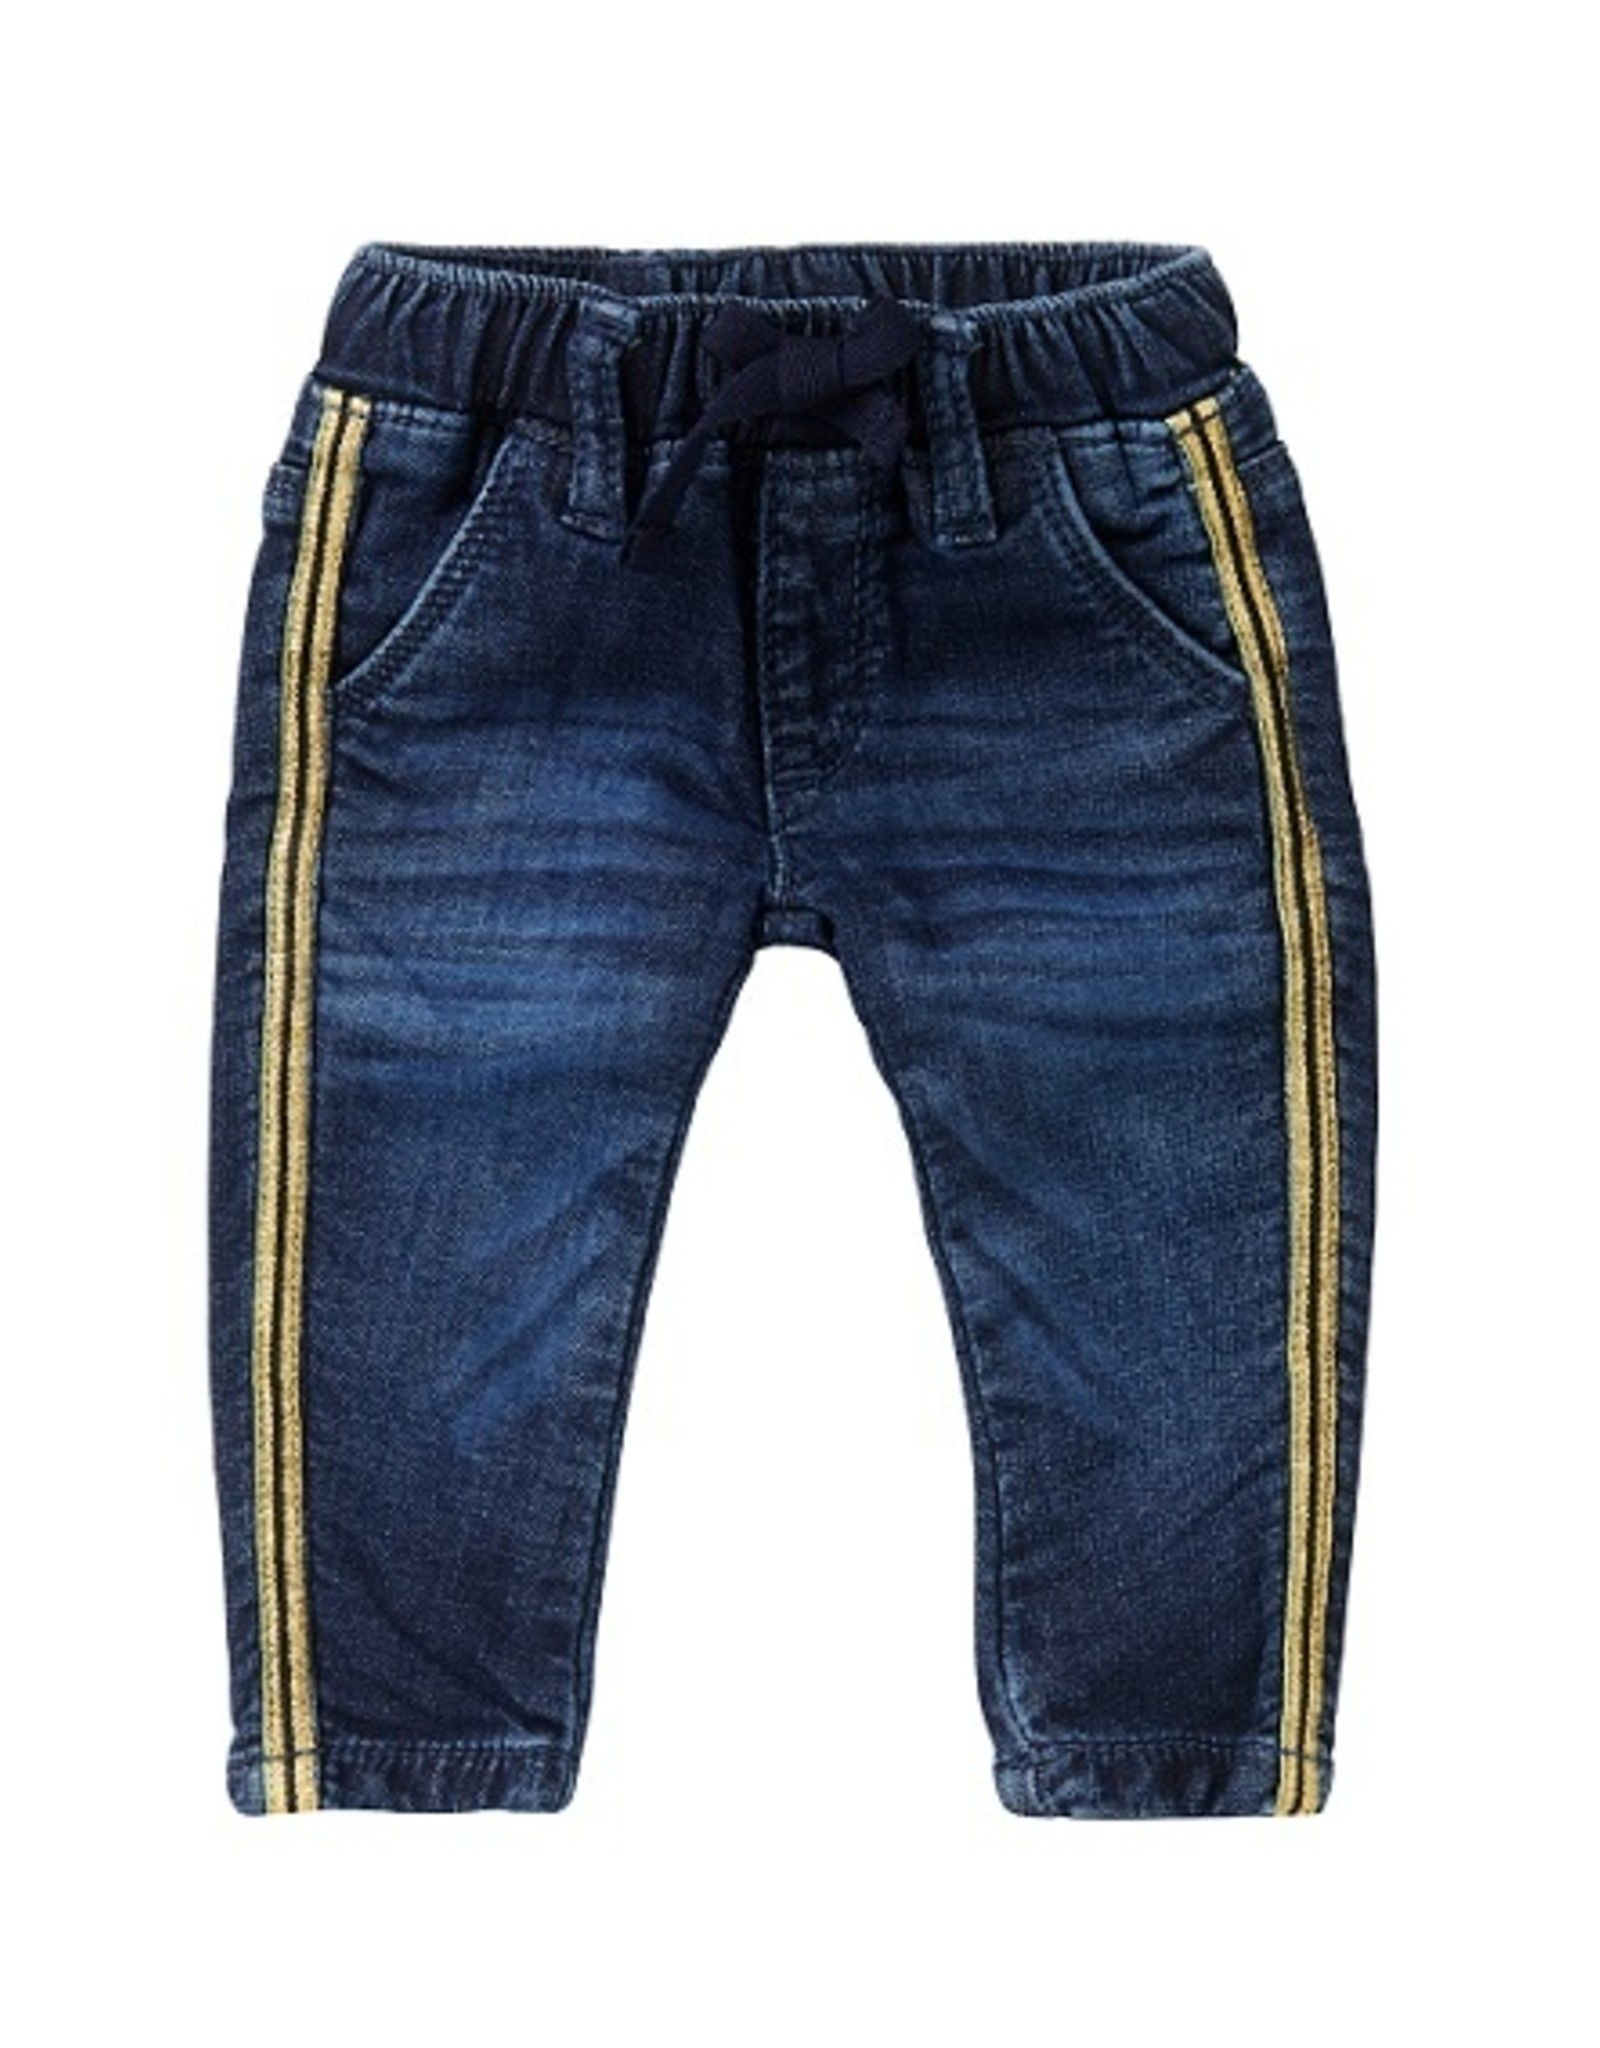 Noppies Jeansbroek meisjes  gouden streep